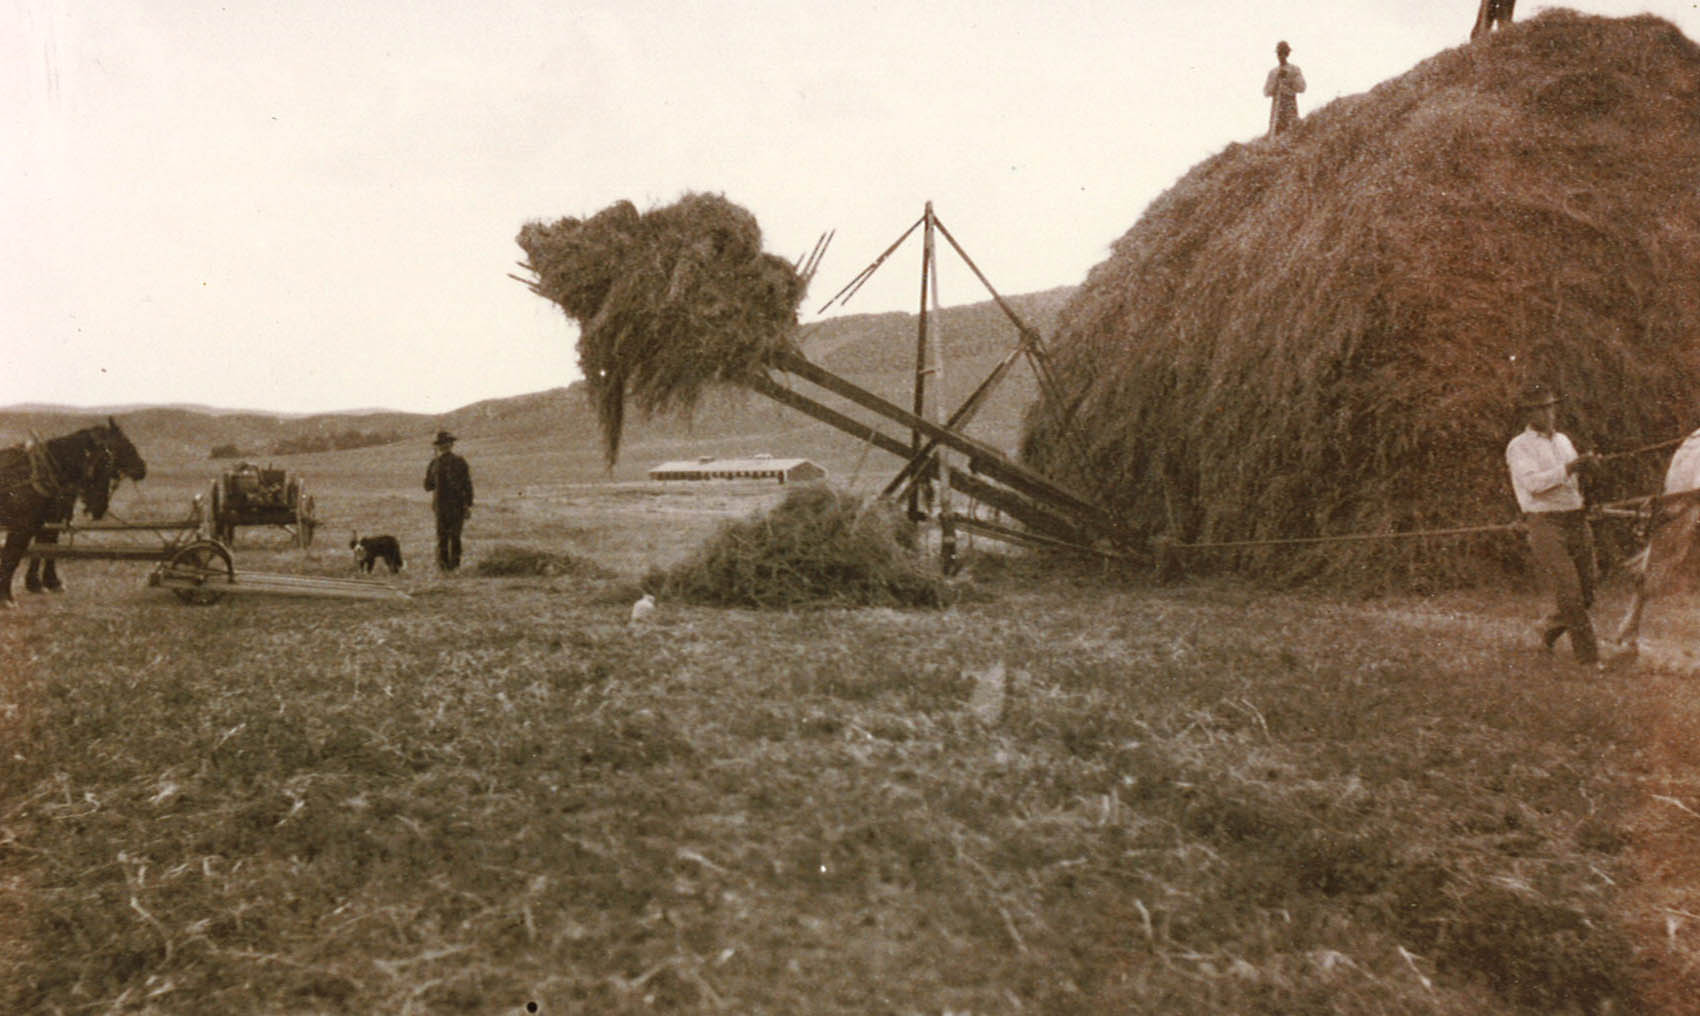 Wagonhound Land & Livestock History